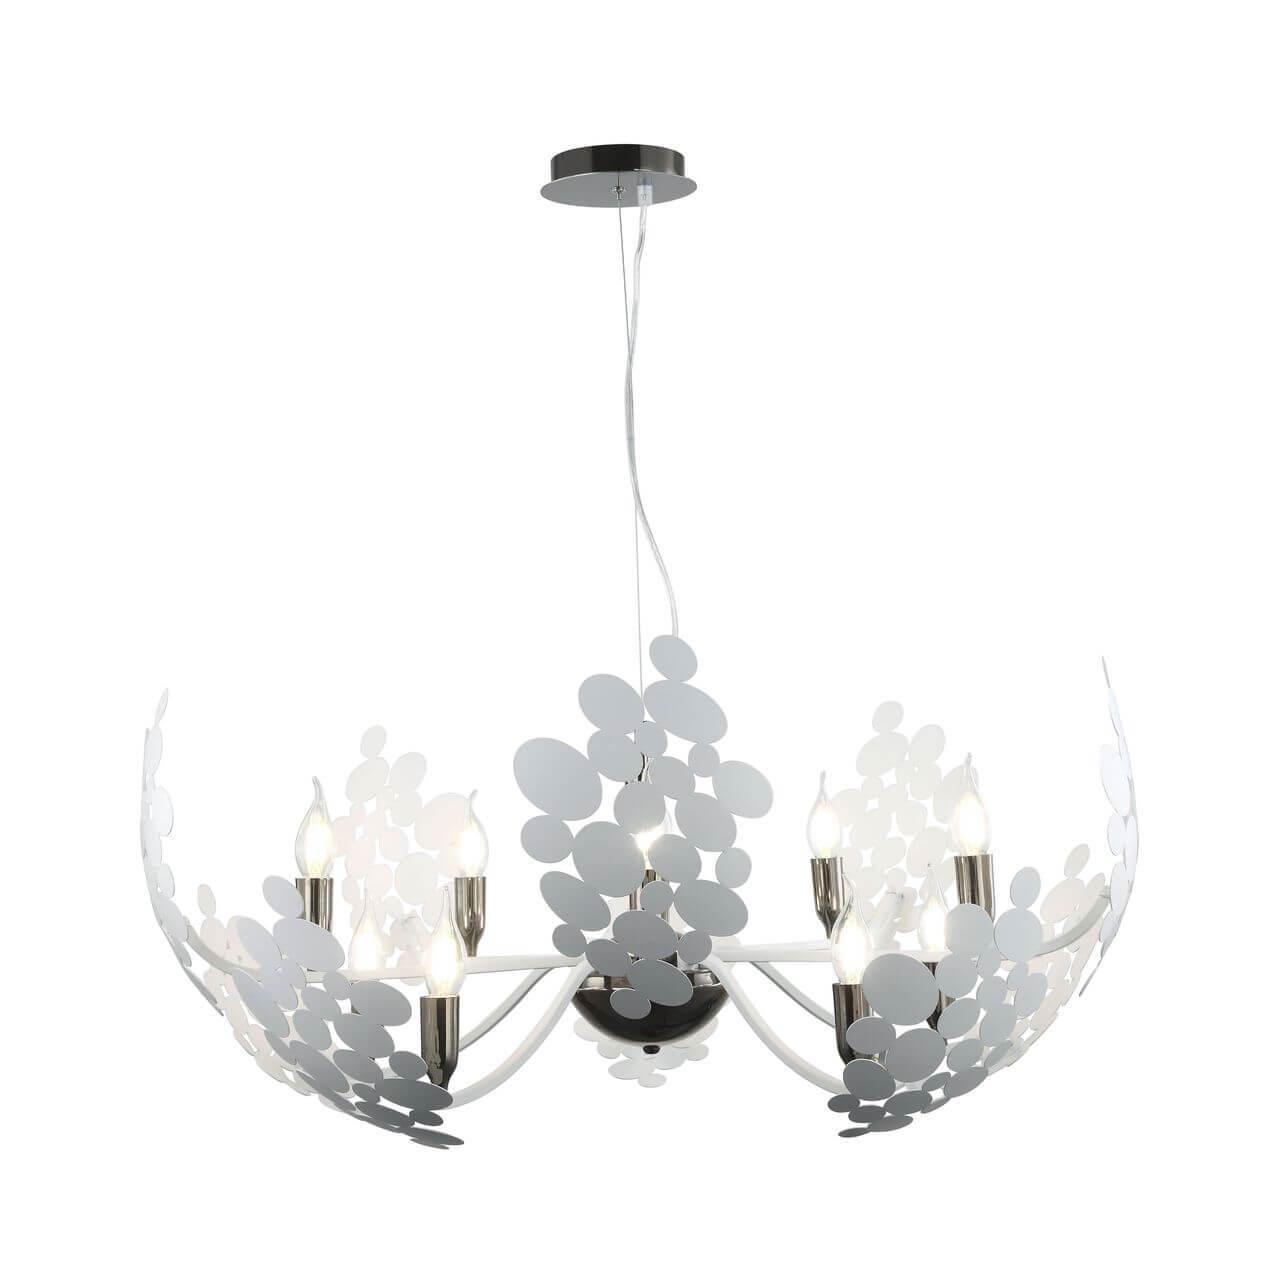 Подвесной светильник Favourite 2050-10P, E14, 40 Вт